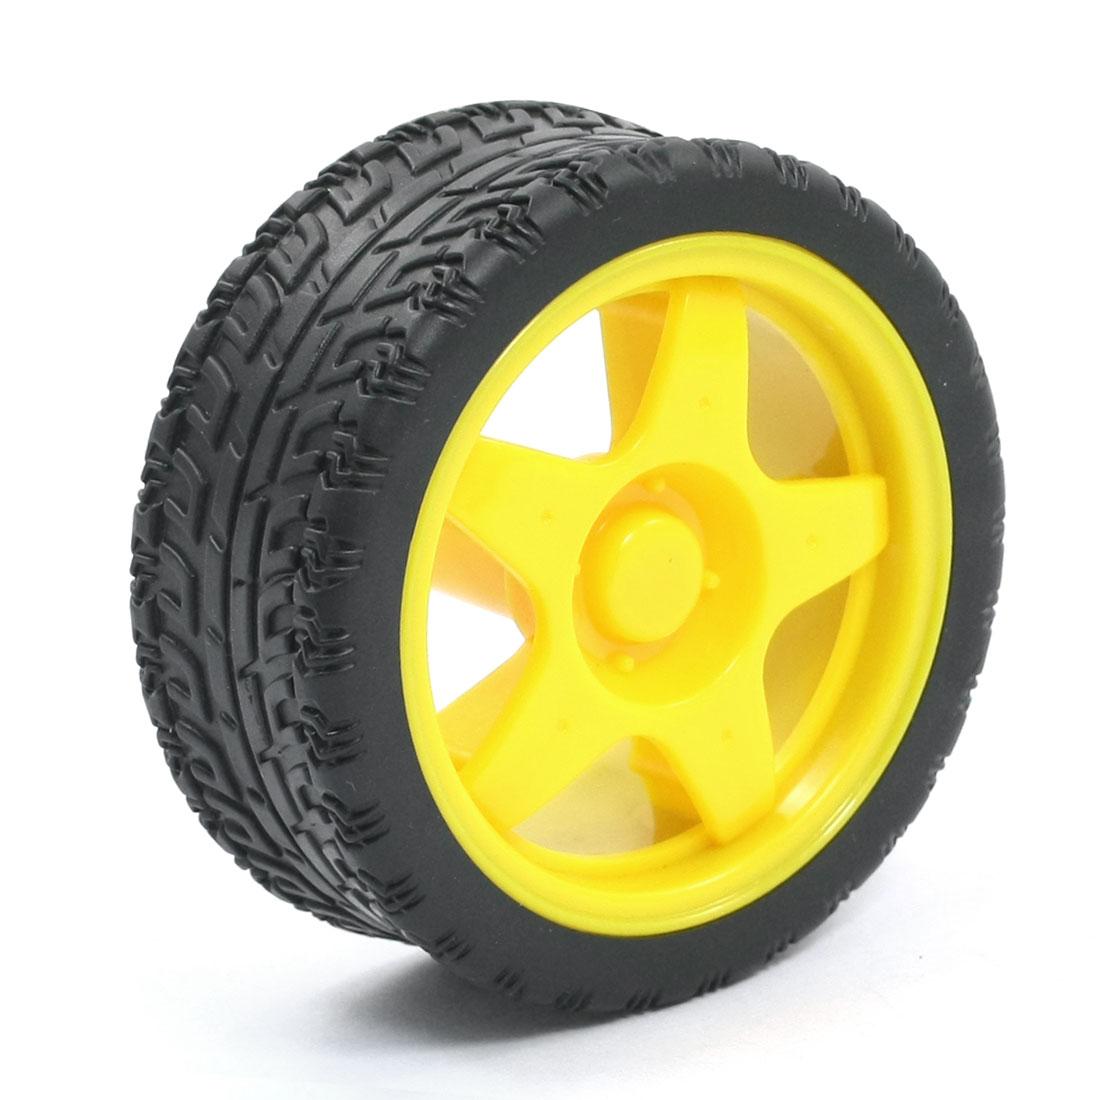 RC Smart Cars Truck Parts Yellow Plastic Hub 1:10 Drift Wheel Tire